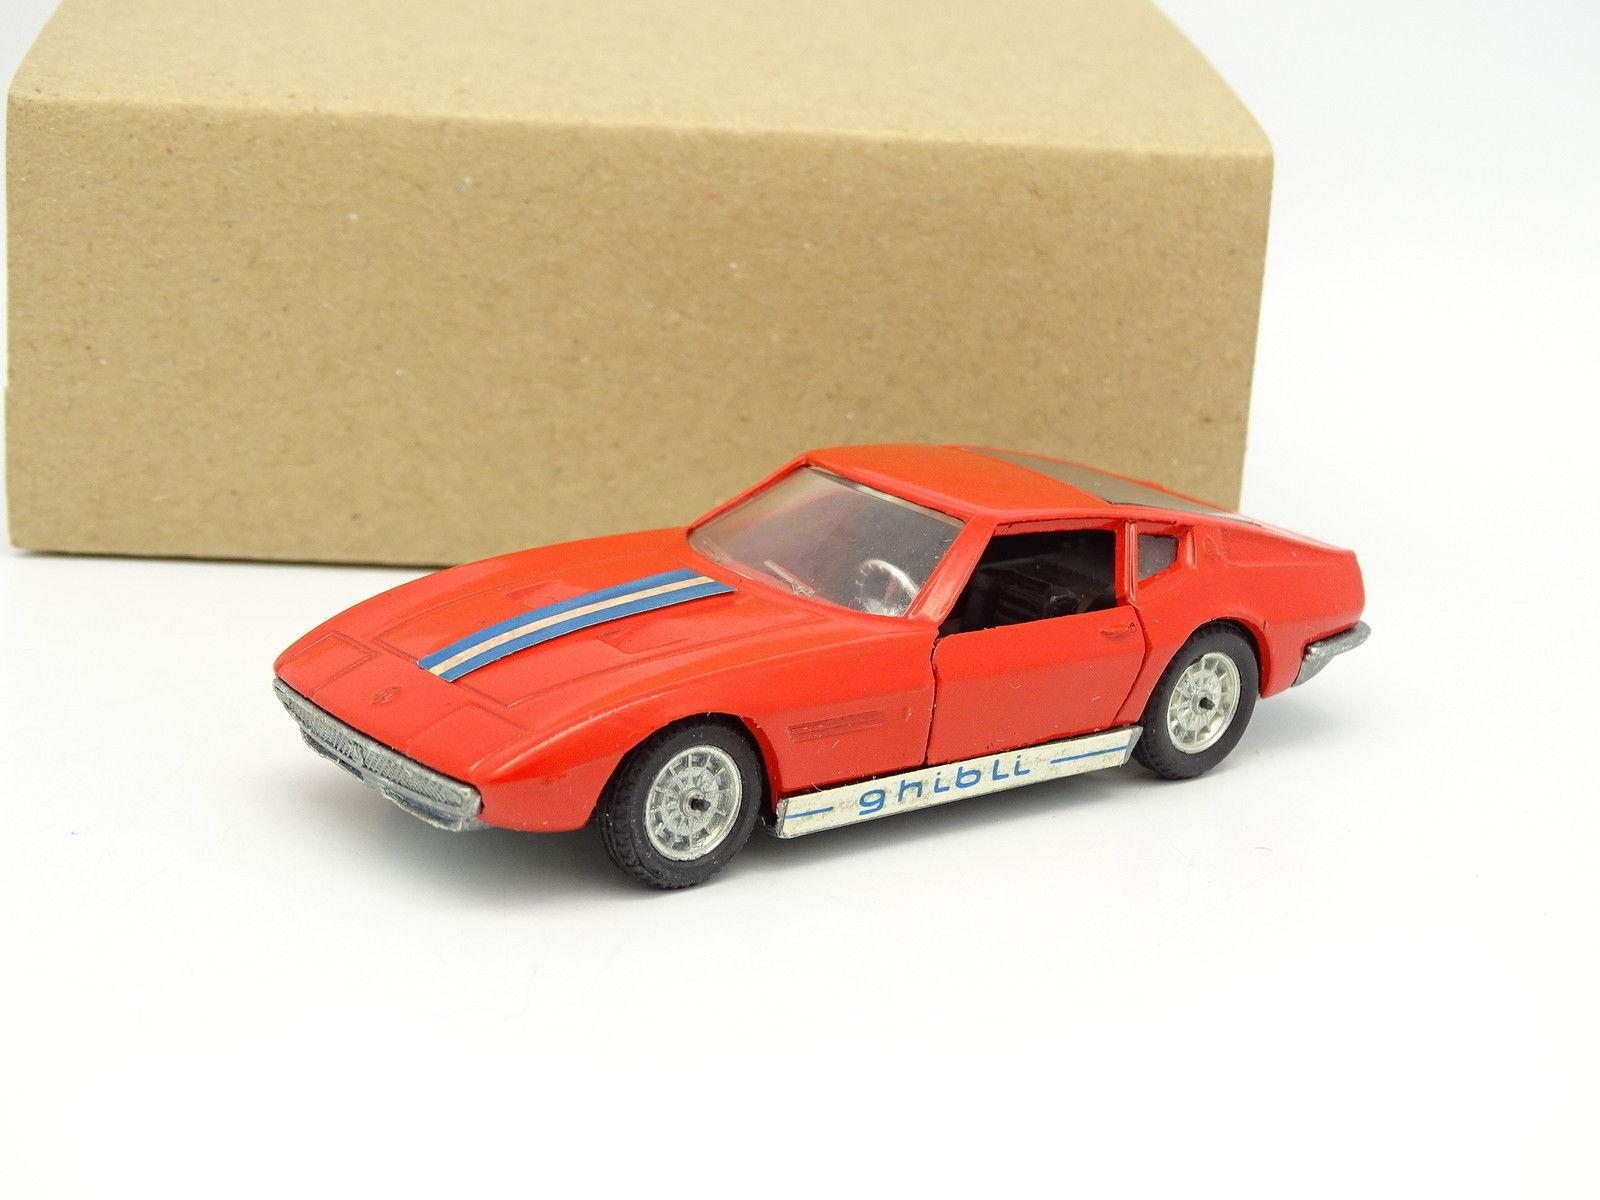 Politoys 1/43 - Maserati Ghibli Ghia Rosso